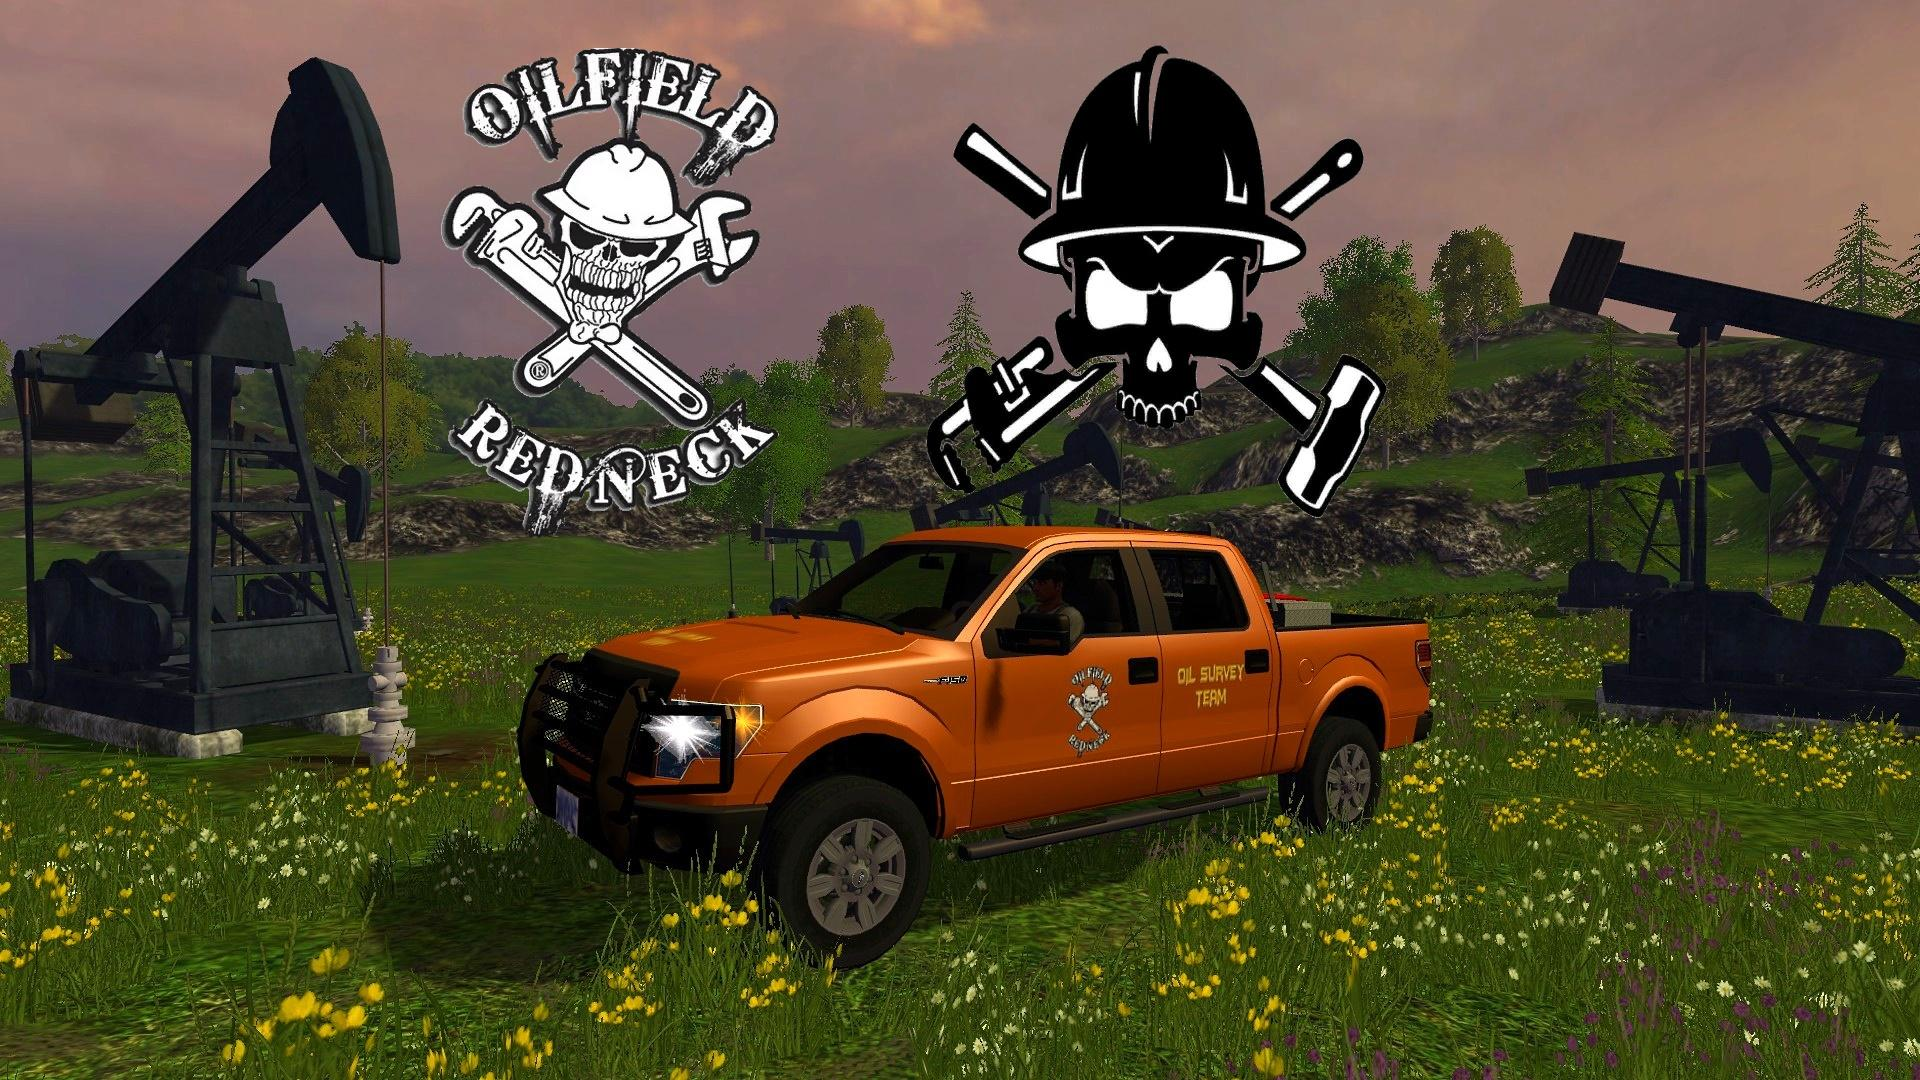 oilfield-rednecks-f150-1_1